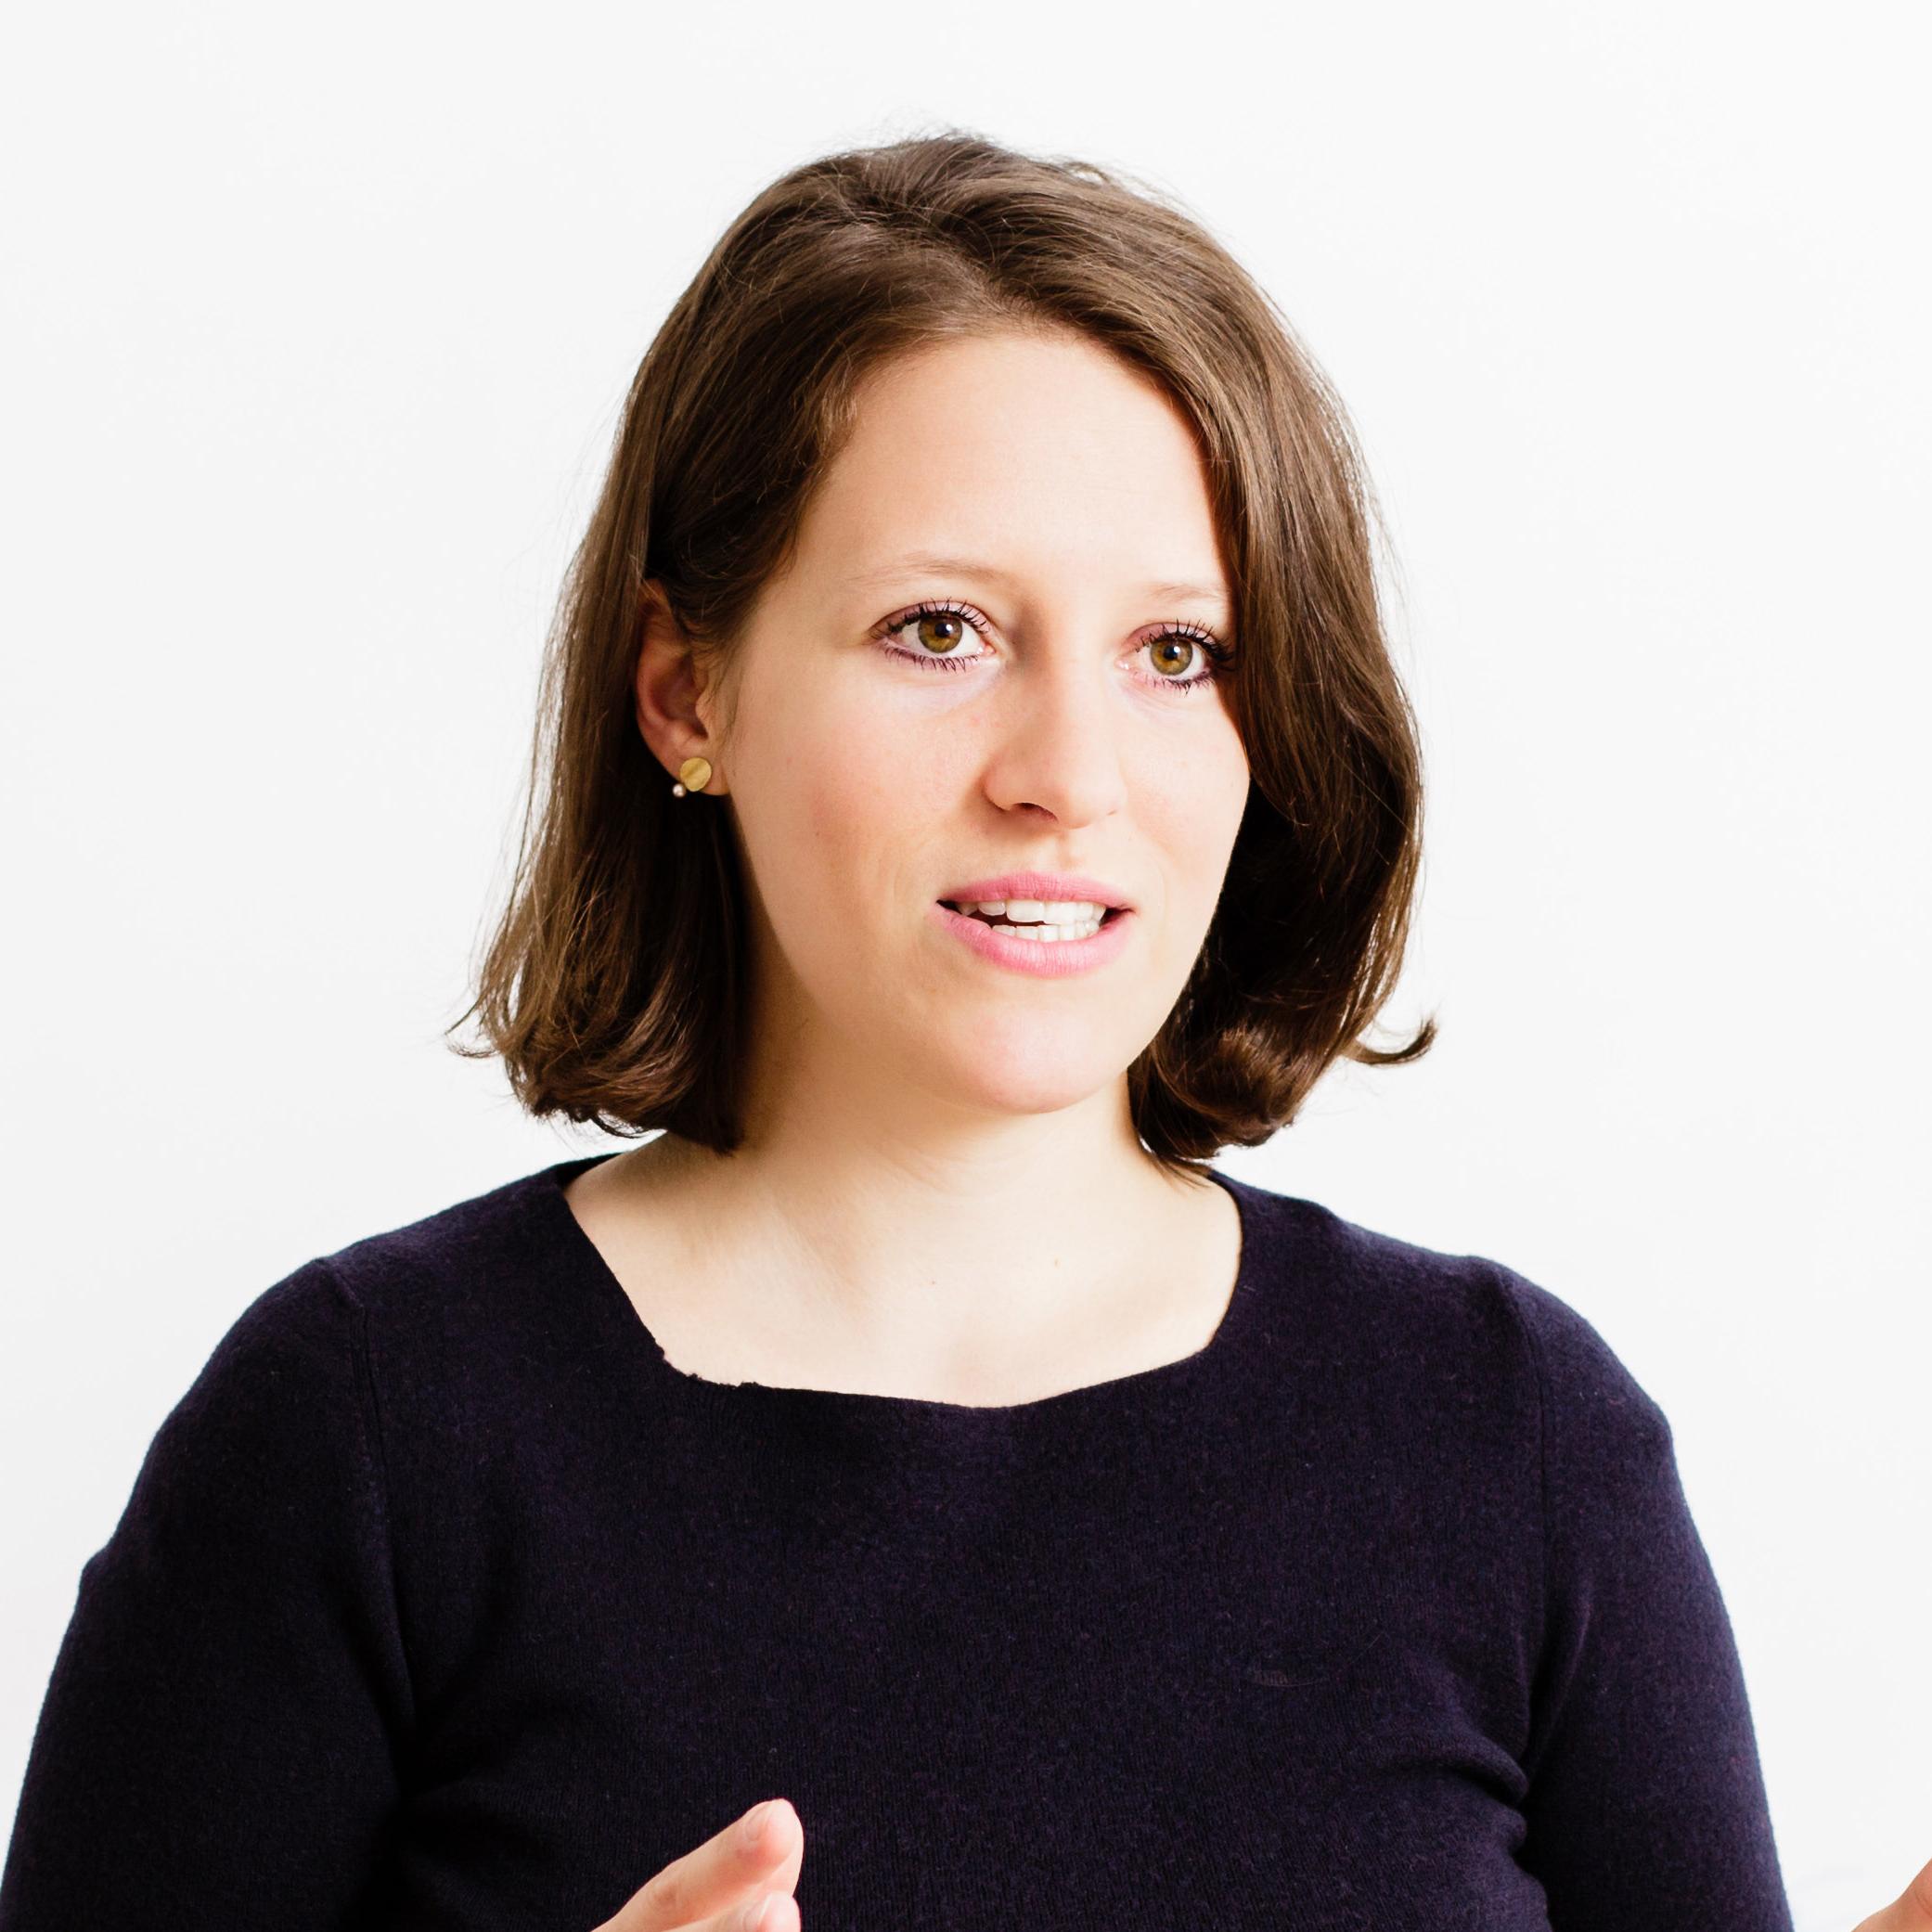 Sarah Brockmeier